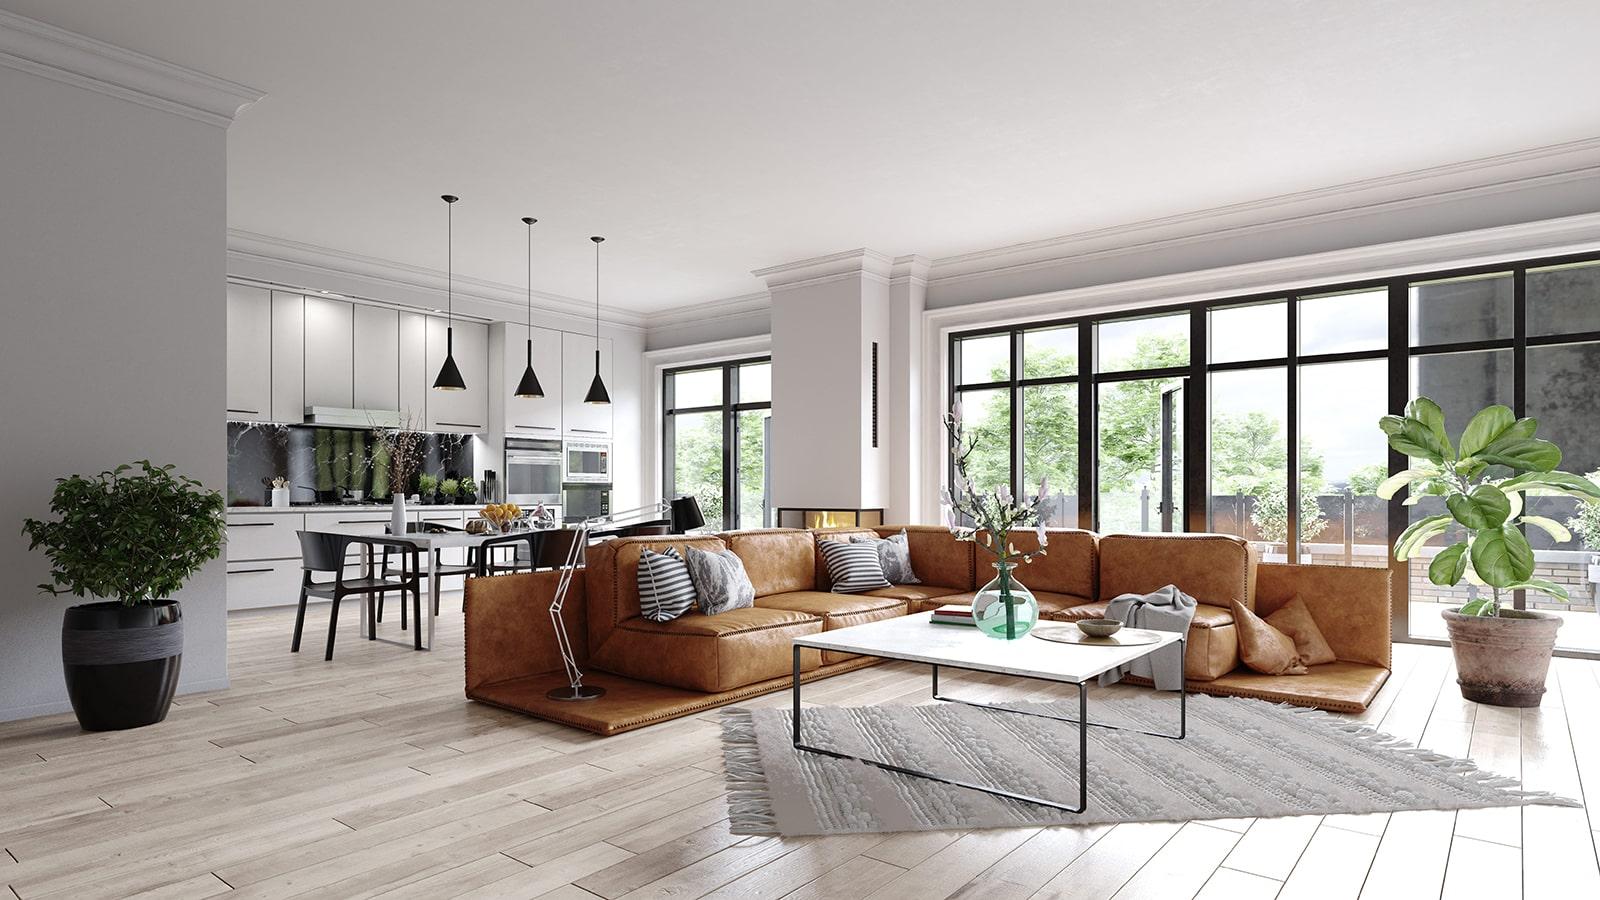 Ivy house group nice interior